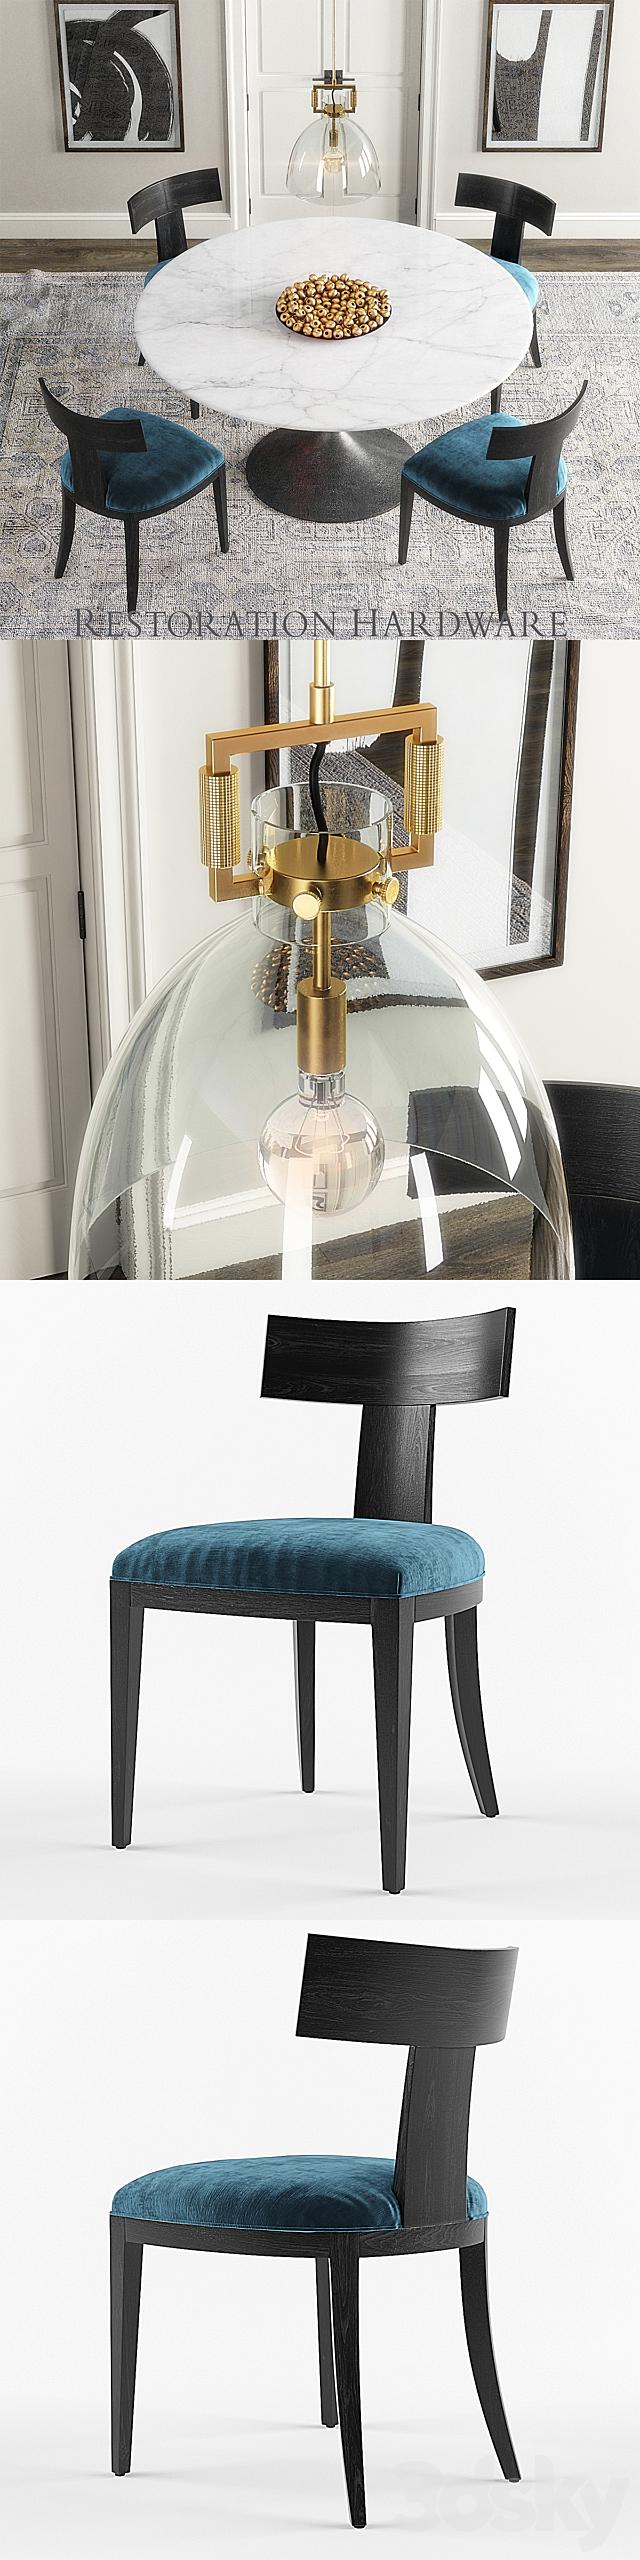 3d models: Table + Chair - RH set